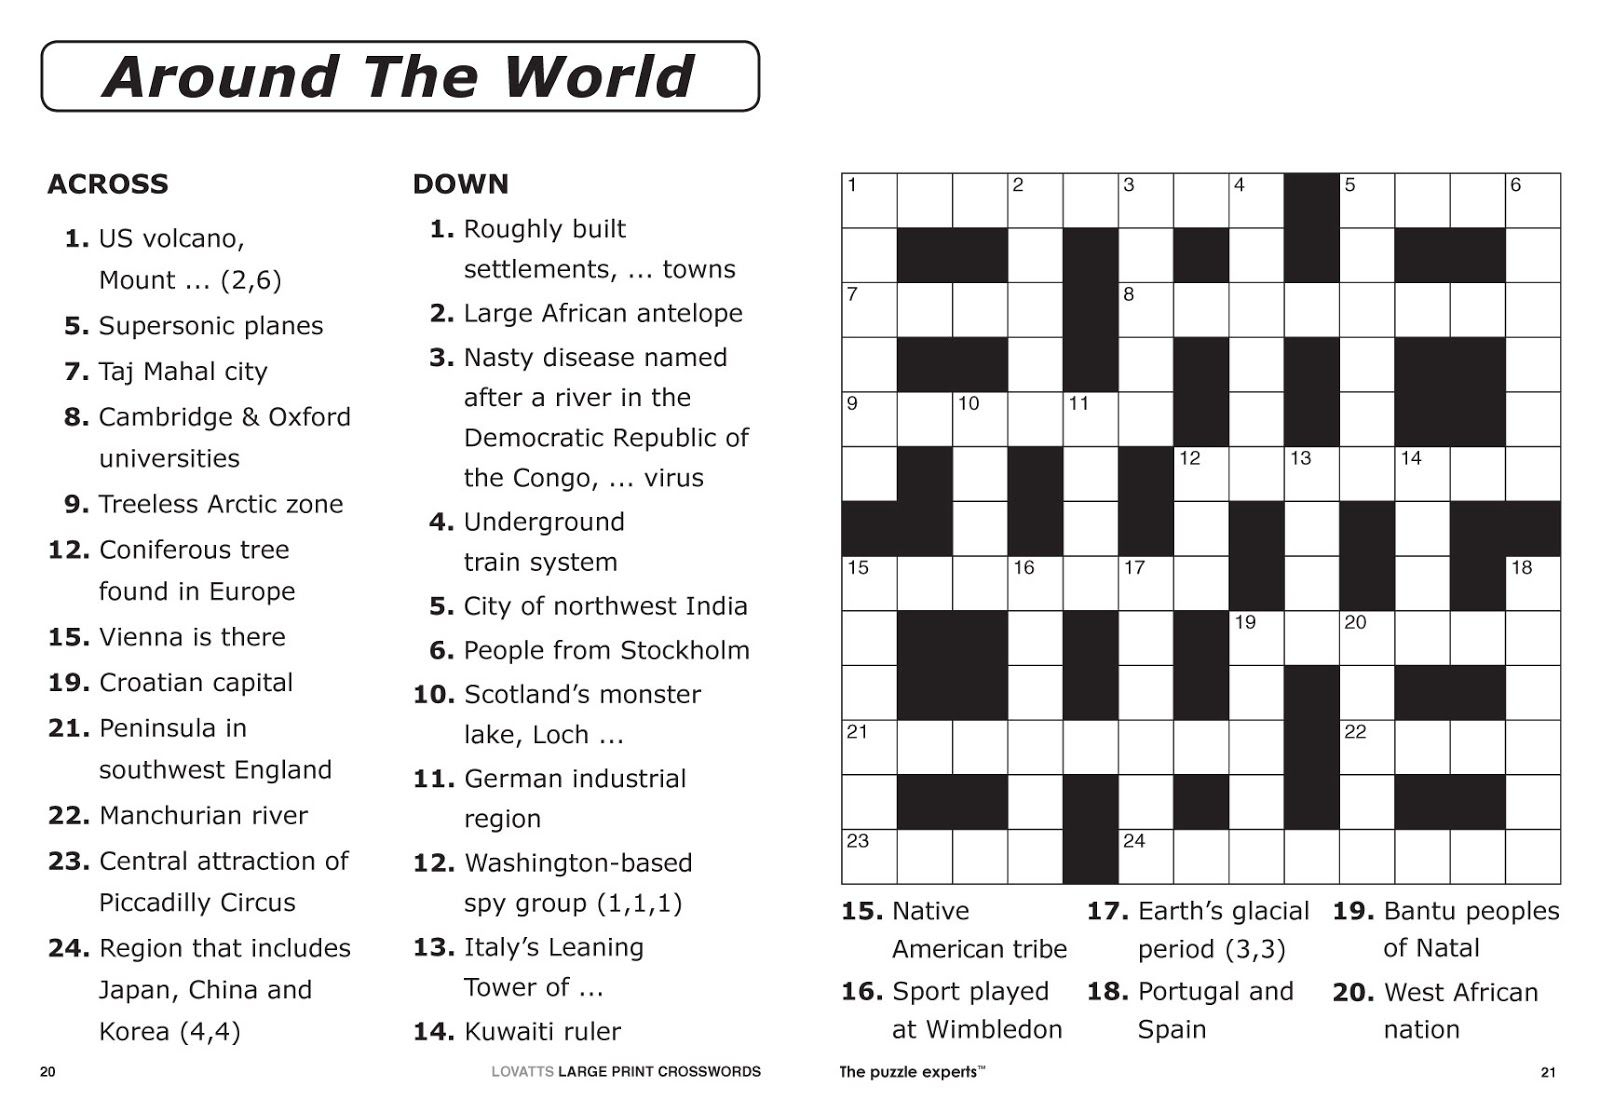 Easy Printable Crossword Puzzles   Elder Care & Dementia Care - Free - Crossword Puzzle Maker That Is Printable